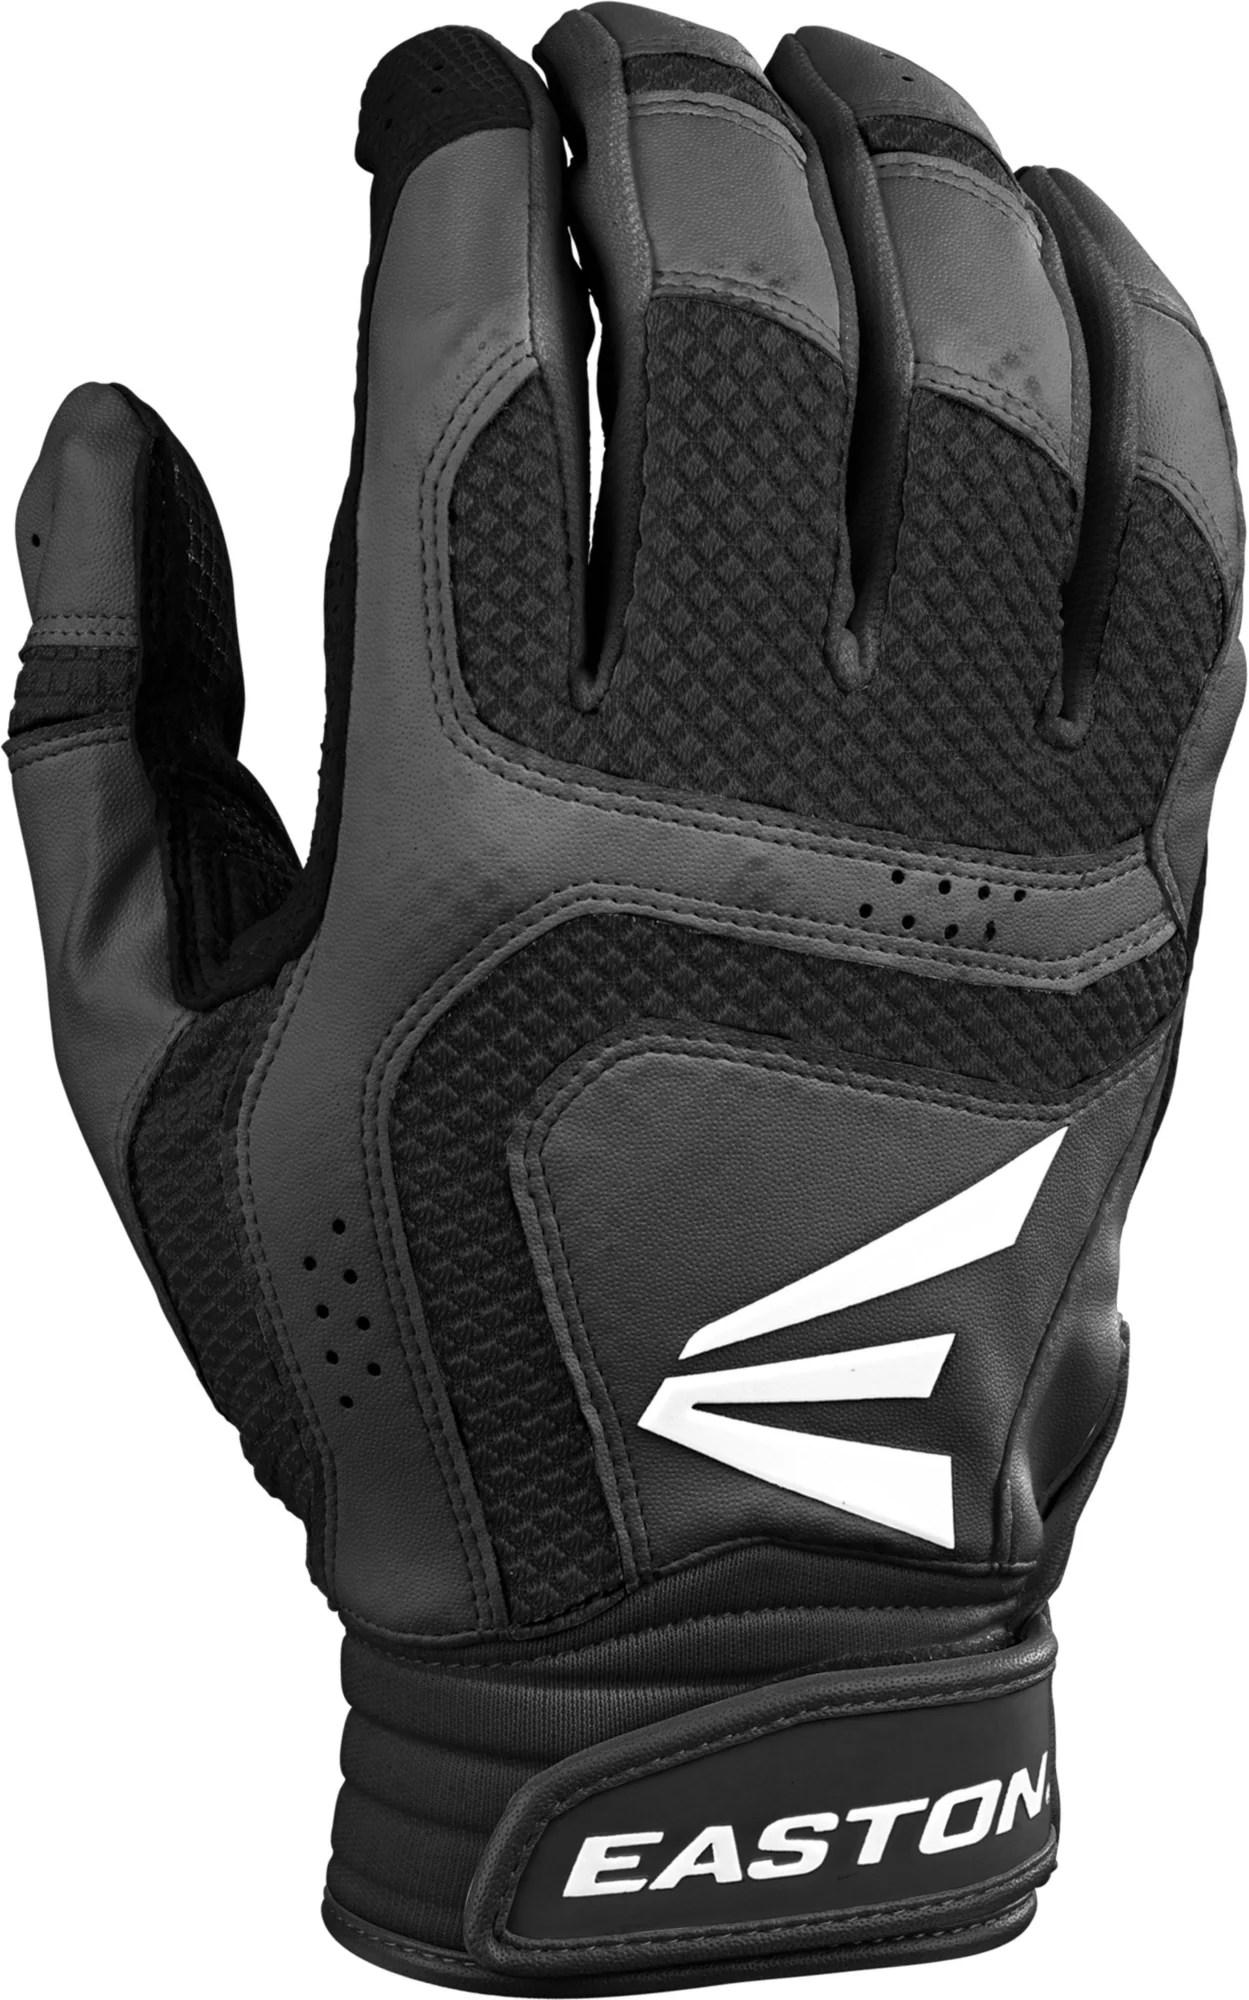 Easton youth vrs icon batting gloves noimagefound also dick   sporting goods rh dickssportinggoods